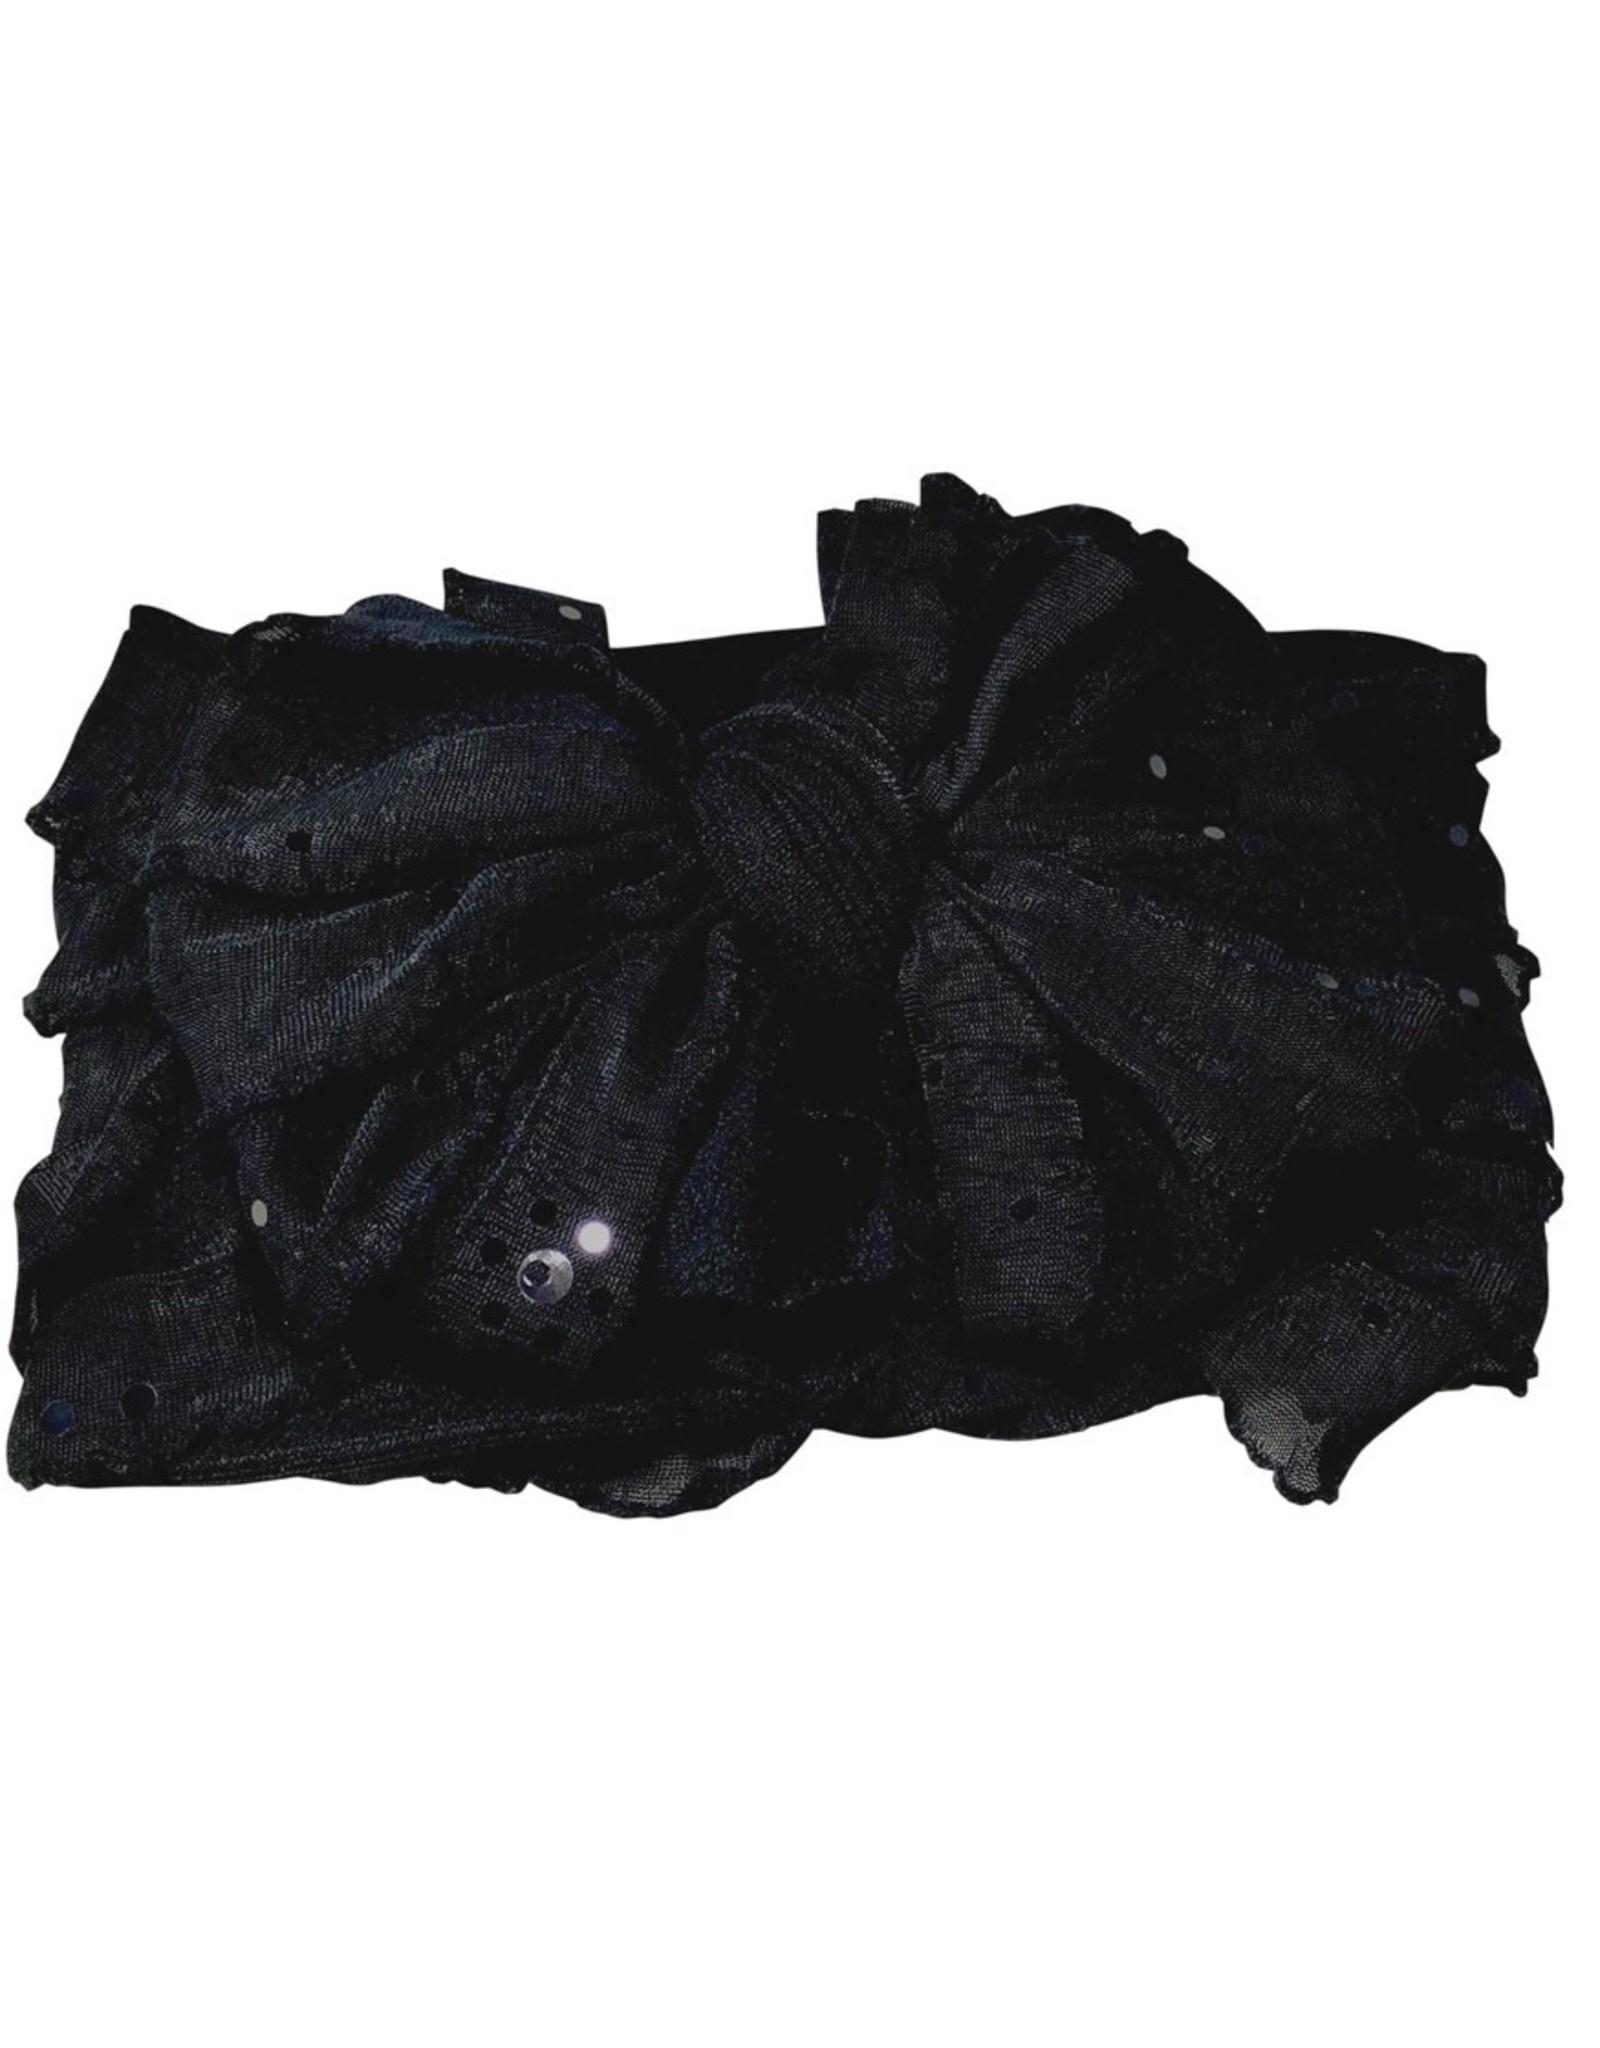 In Awe-Black Sequin Headband